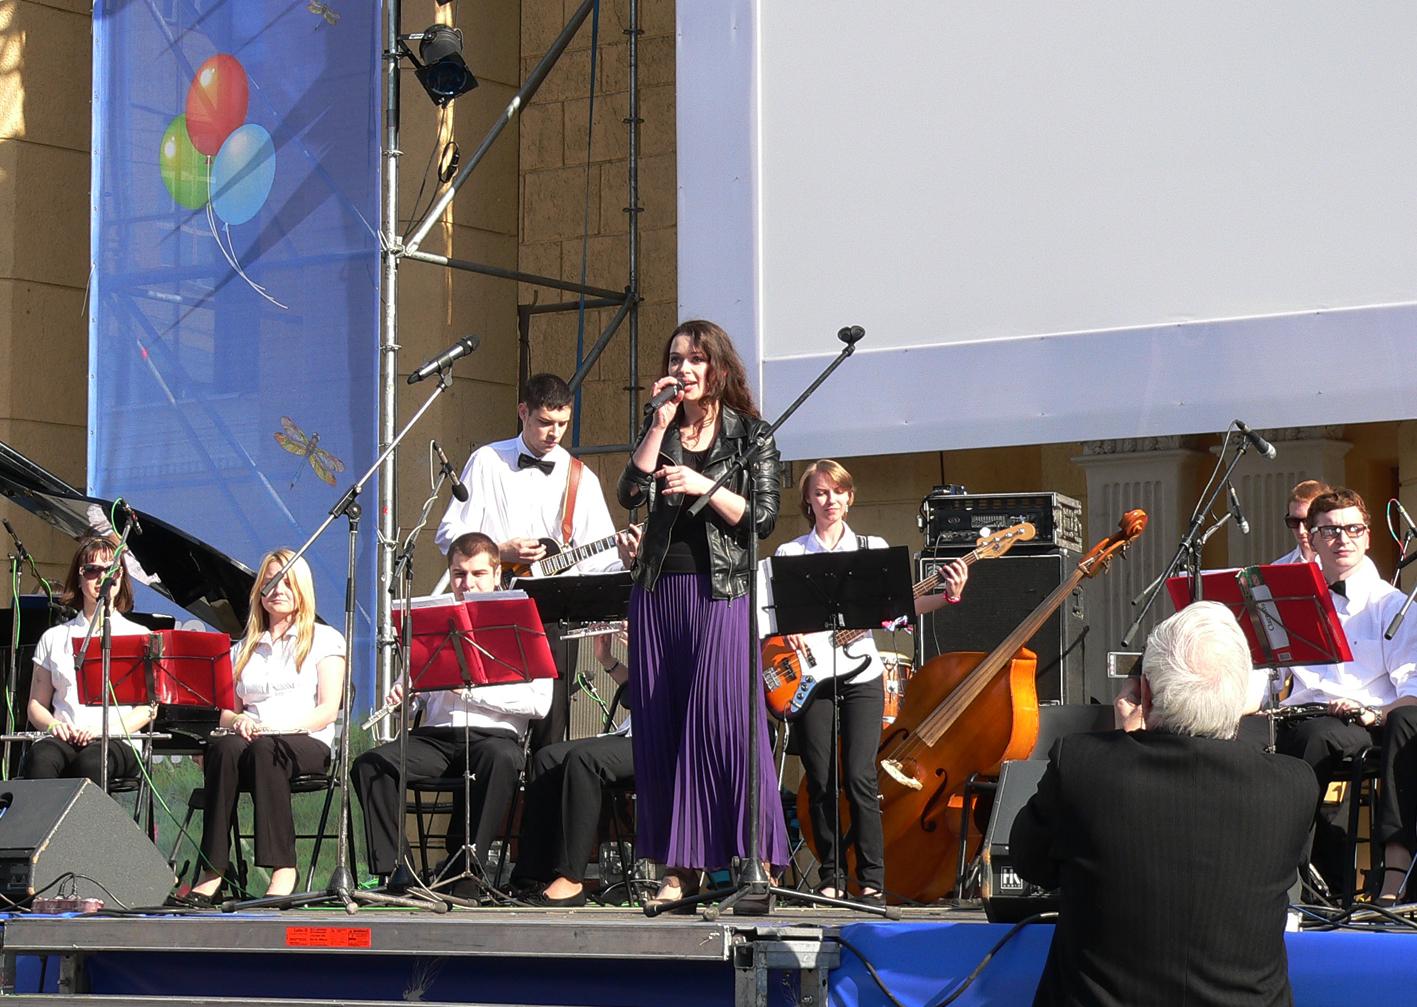 Фотография-джазового-фестиваля-биг-бэнд-НГТУ